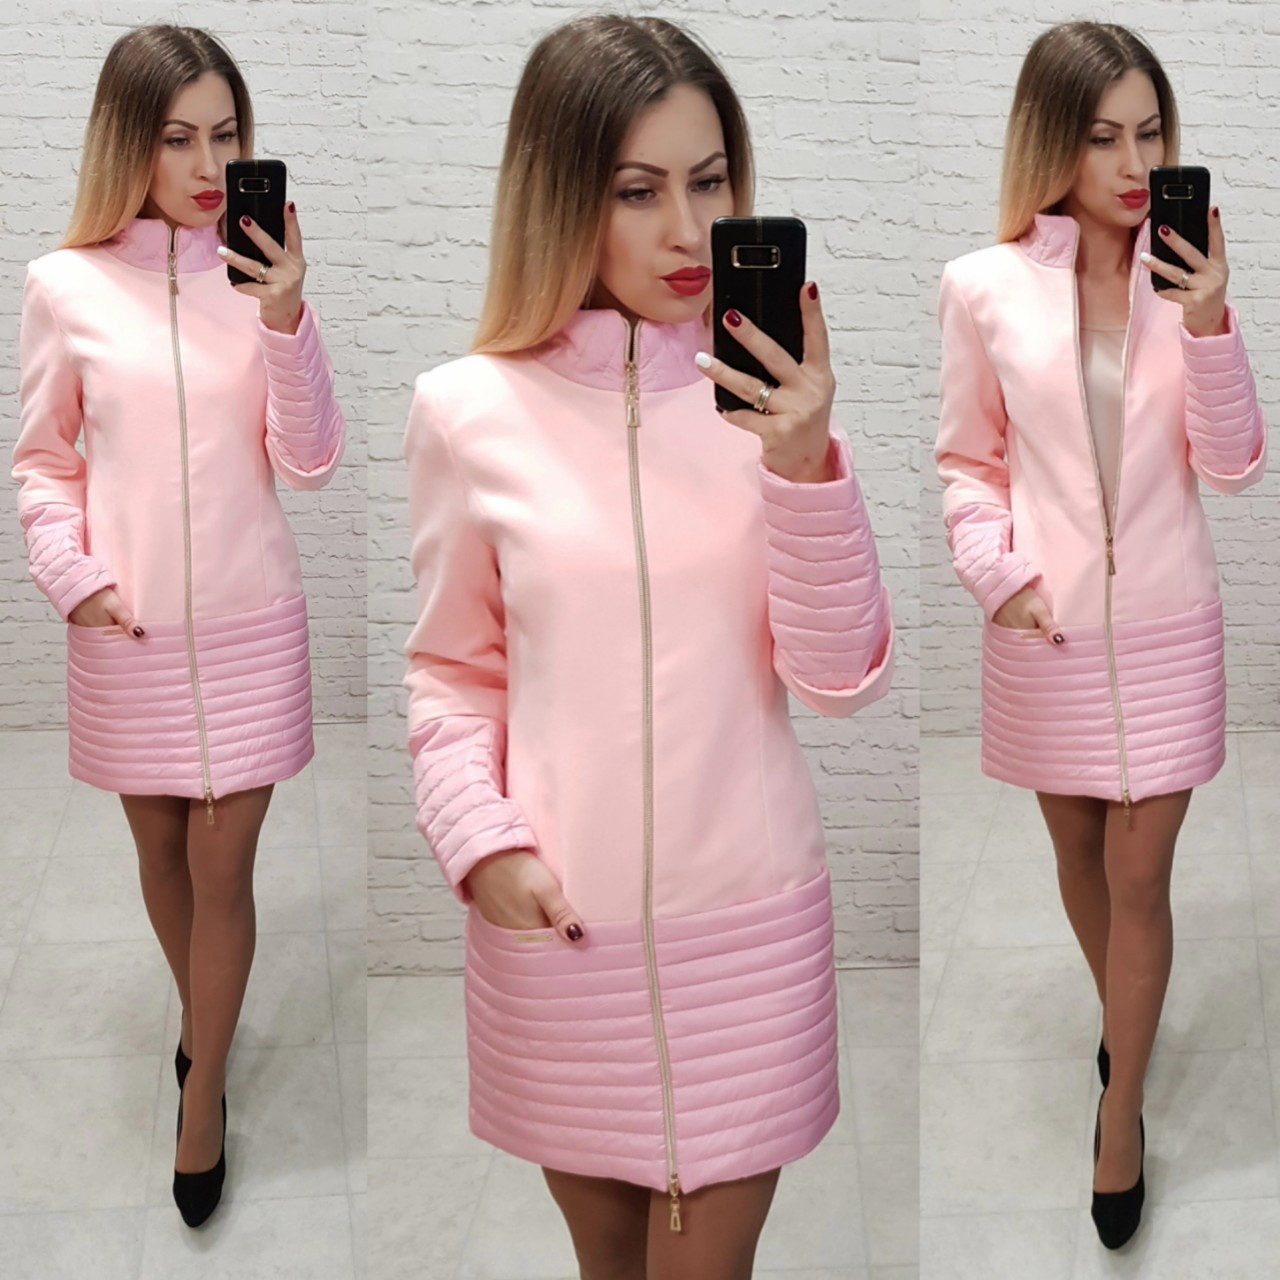 Пальто, арт 137, ткань эко-кашемир + плащевка, цвет розовый